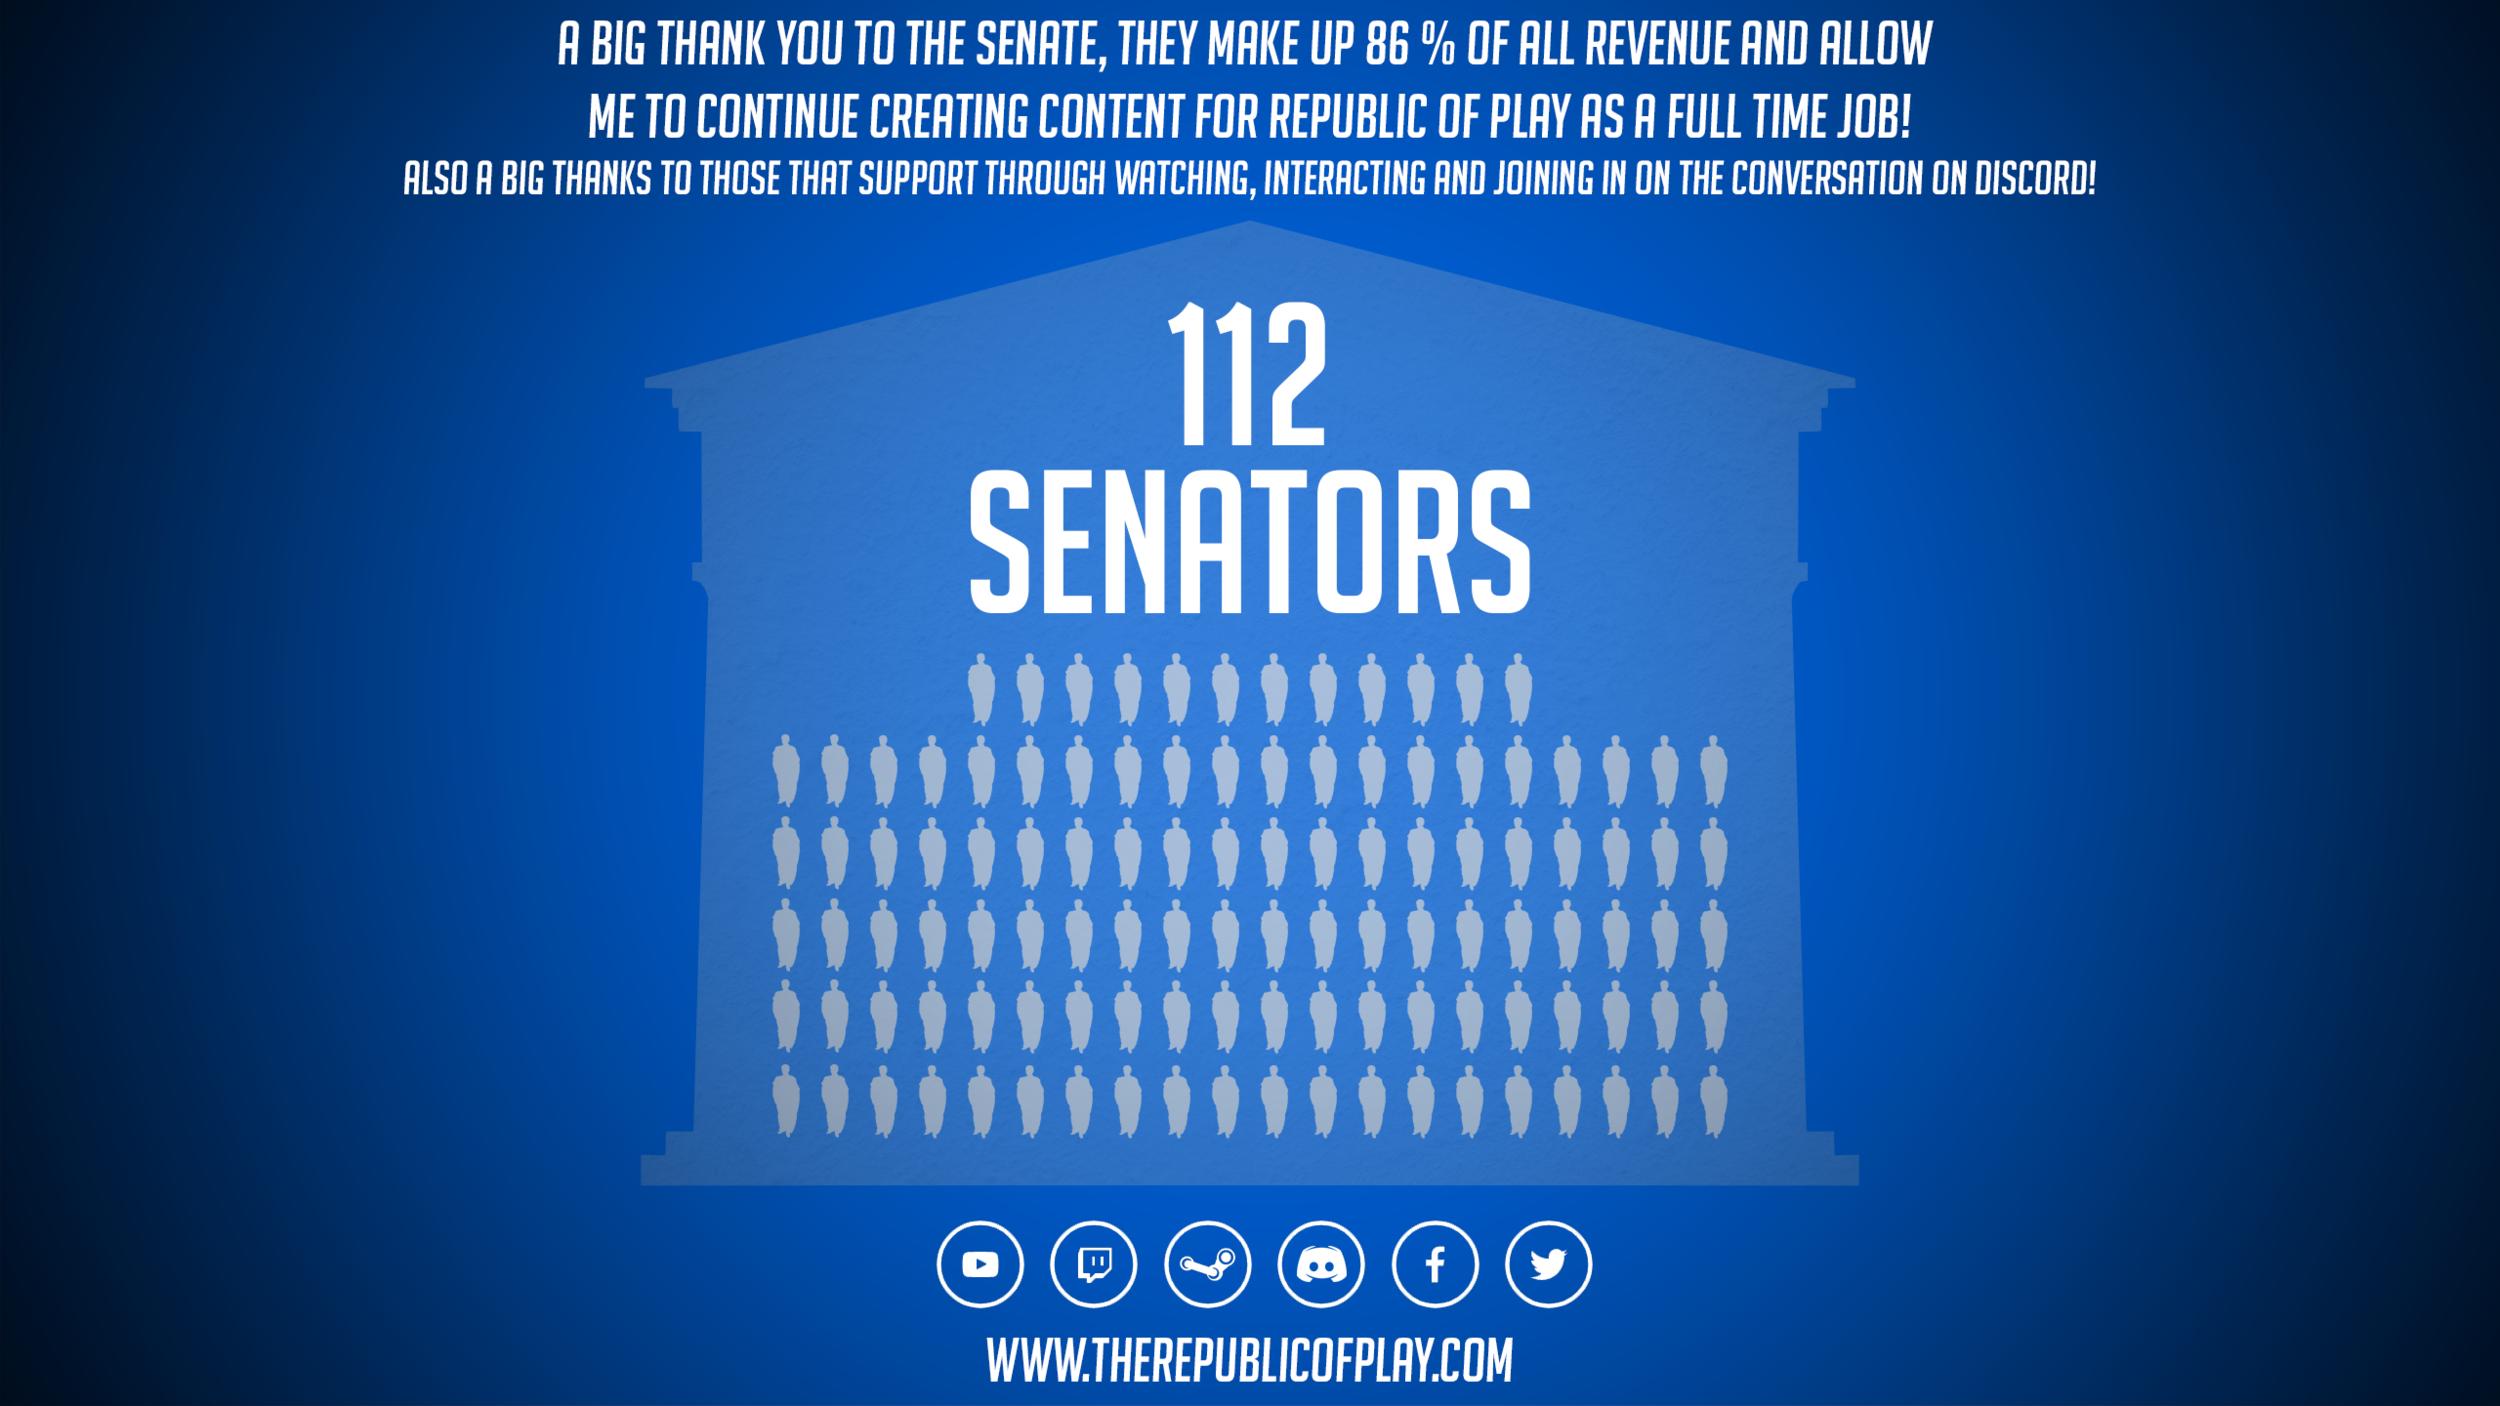 SenatorMilestone.png